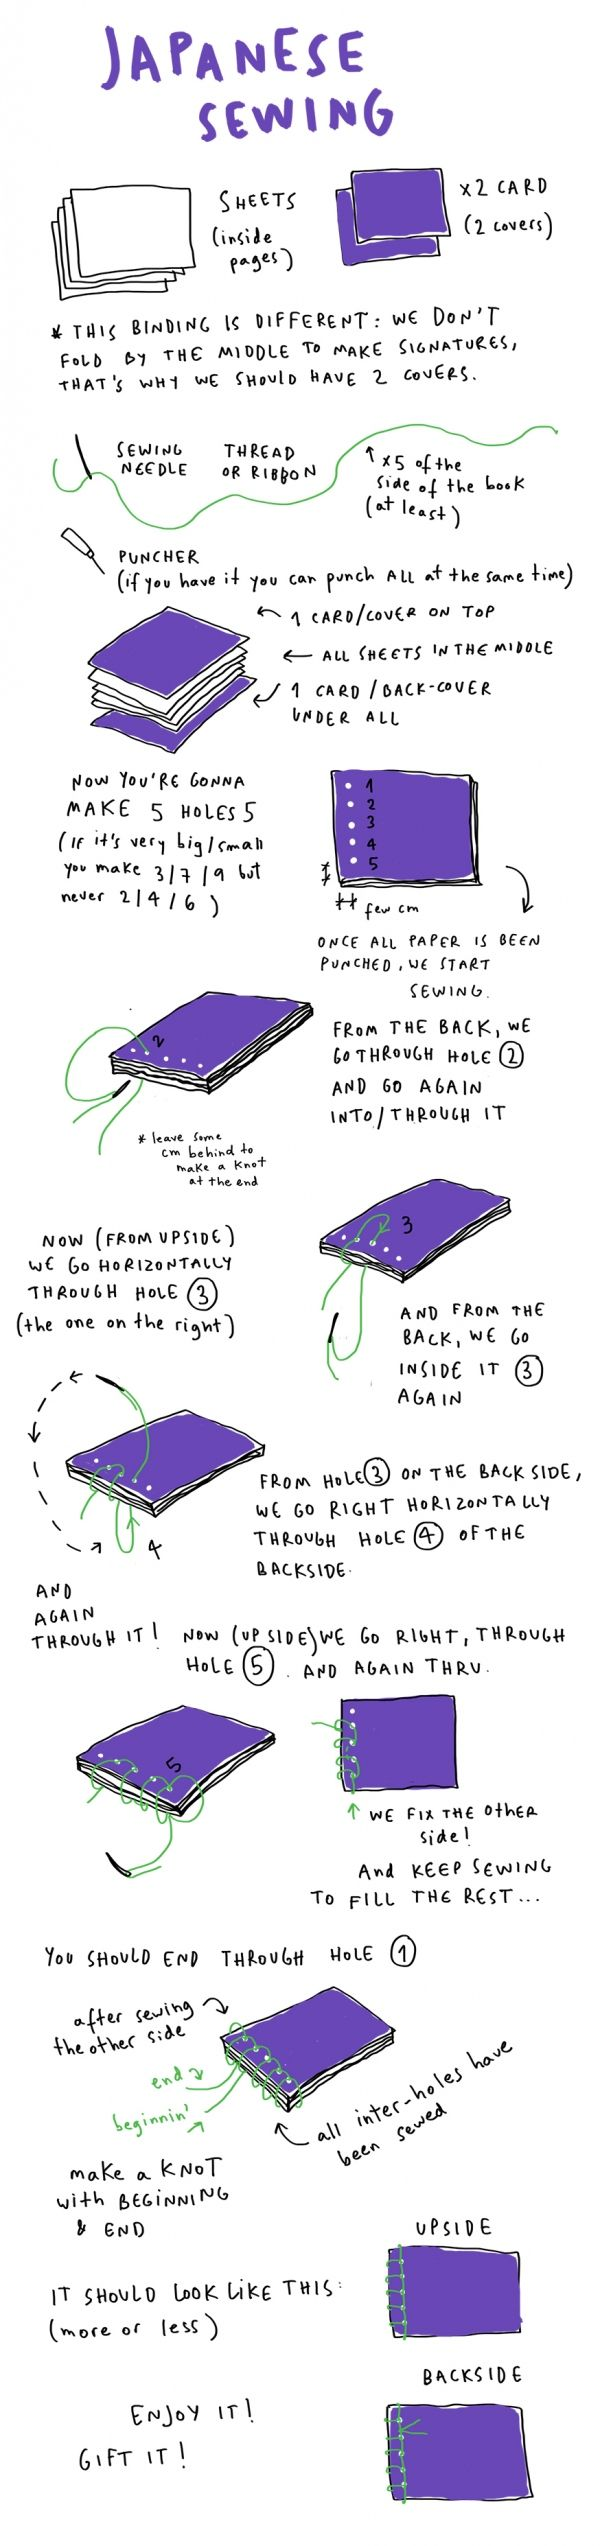 Diy Bookblock Sewing Station1 By Marenne On Deviantart Book Binding Diy Bookbinding Bookbinding Tools